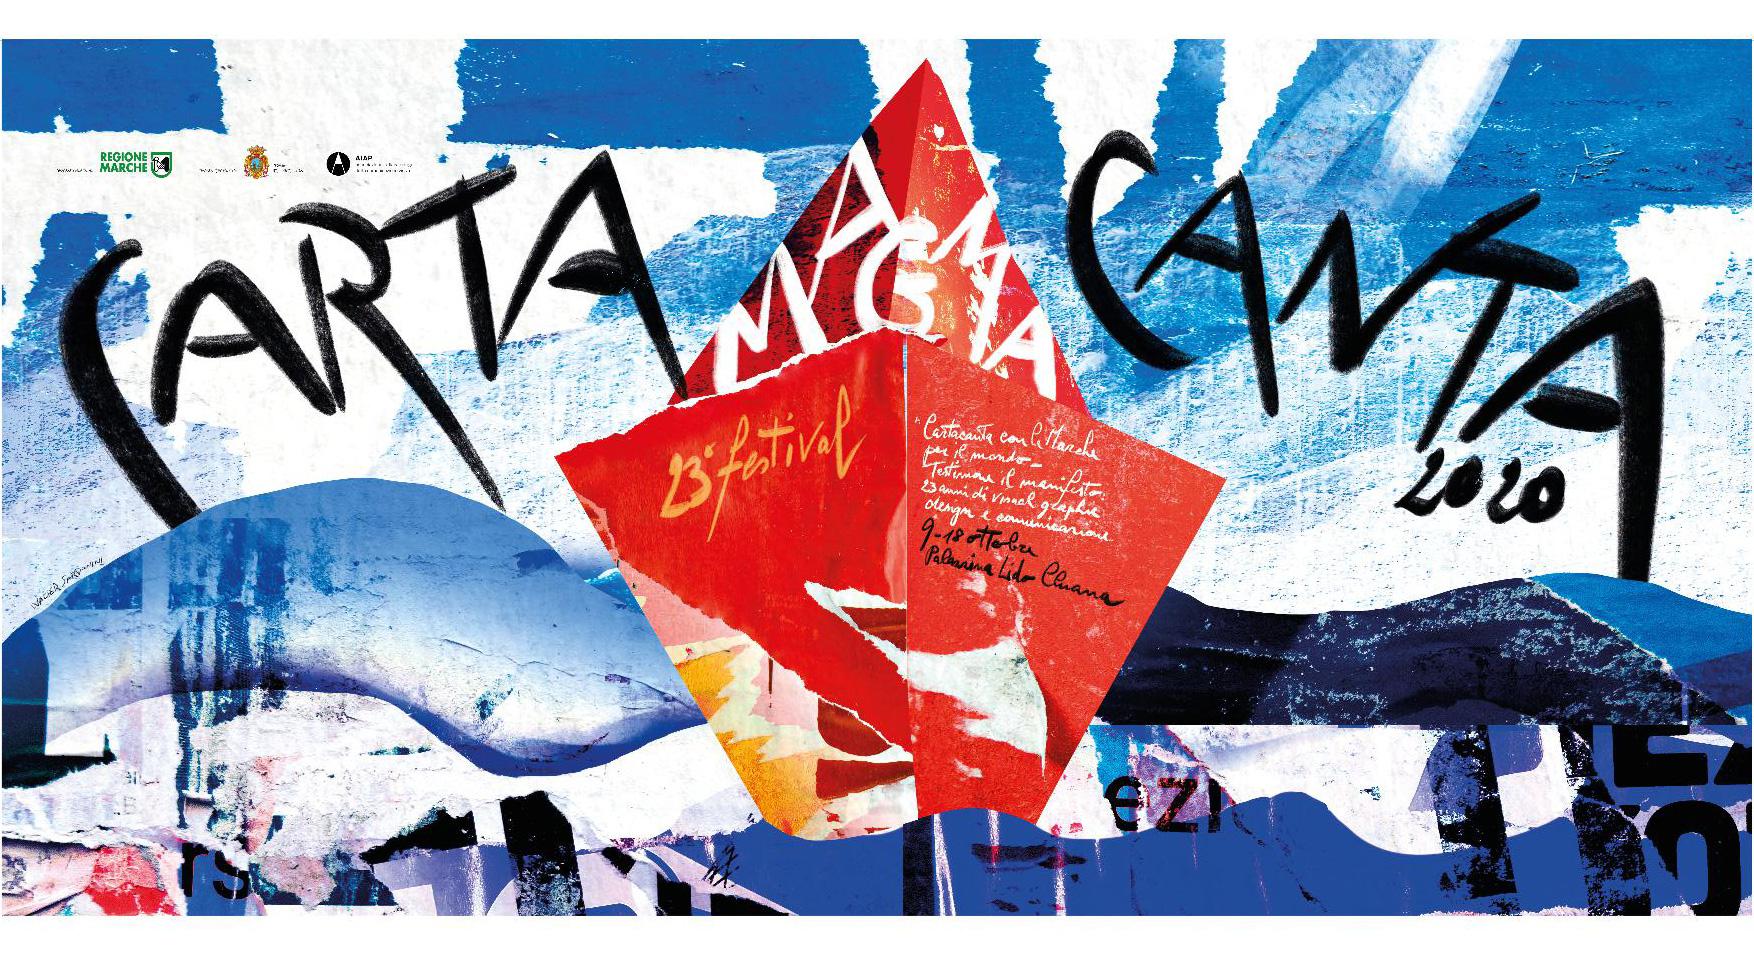 6X3-Cartacanta-2020-1